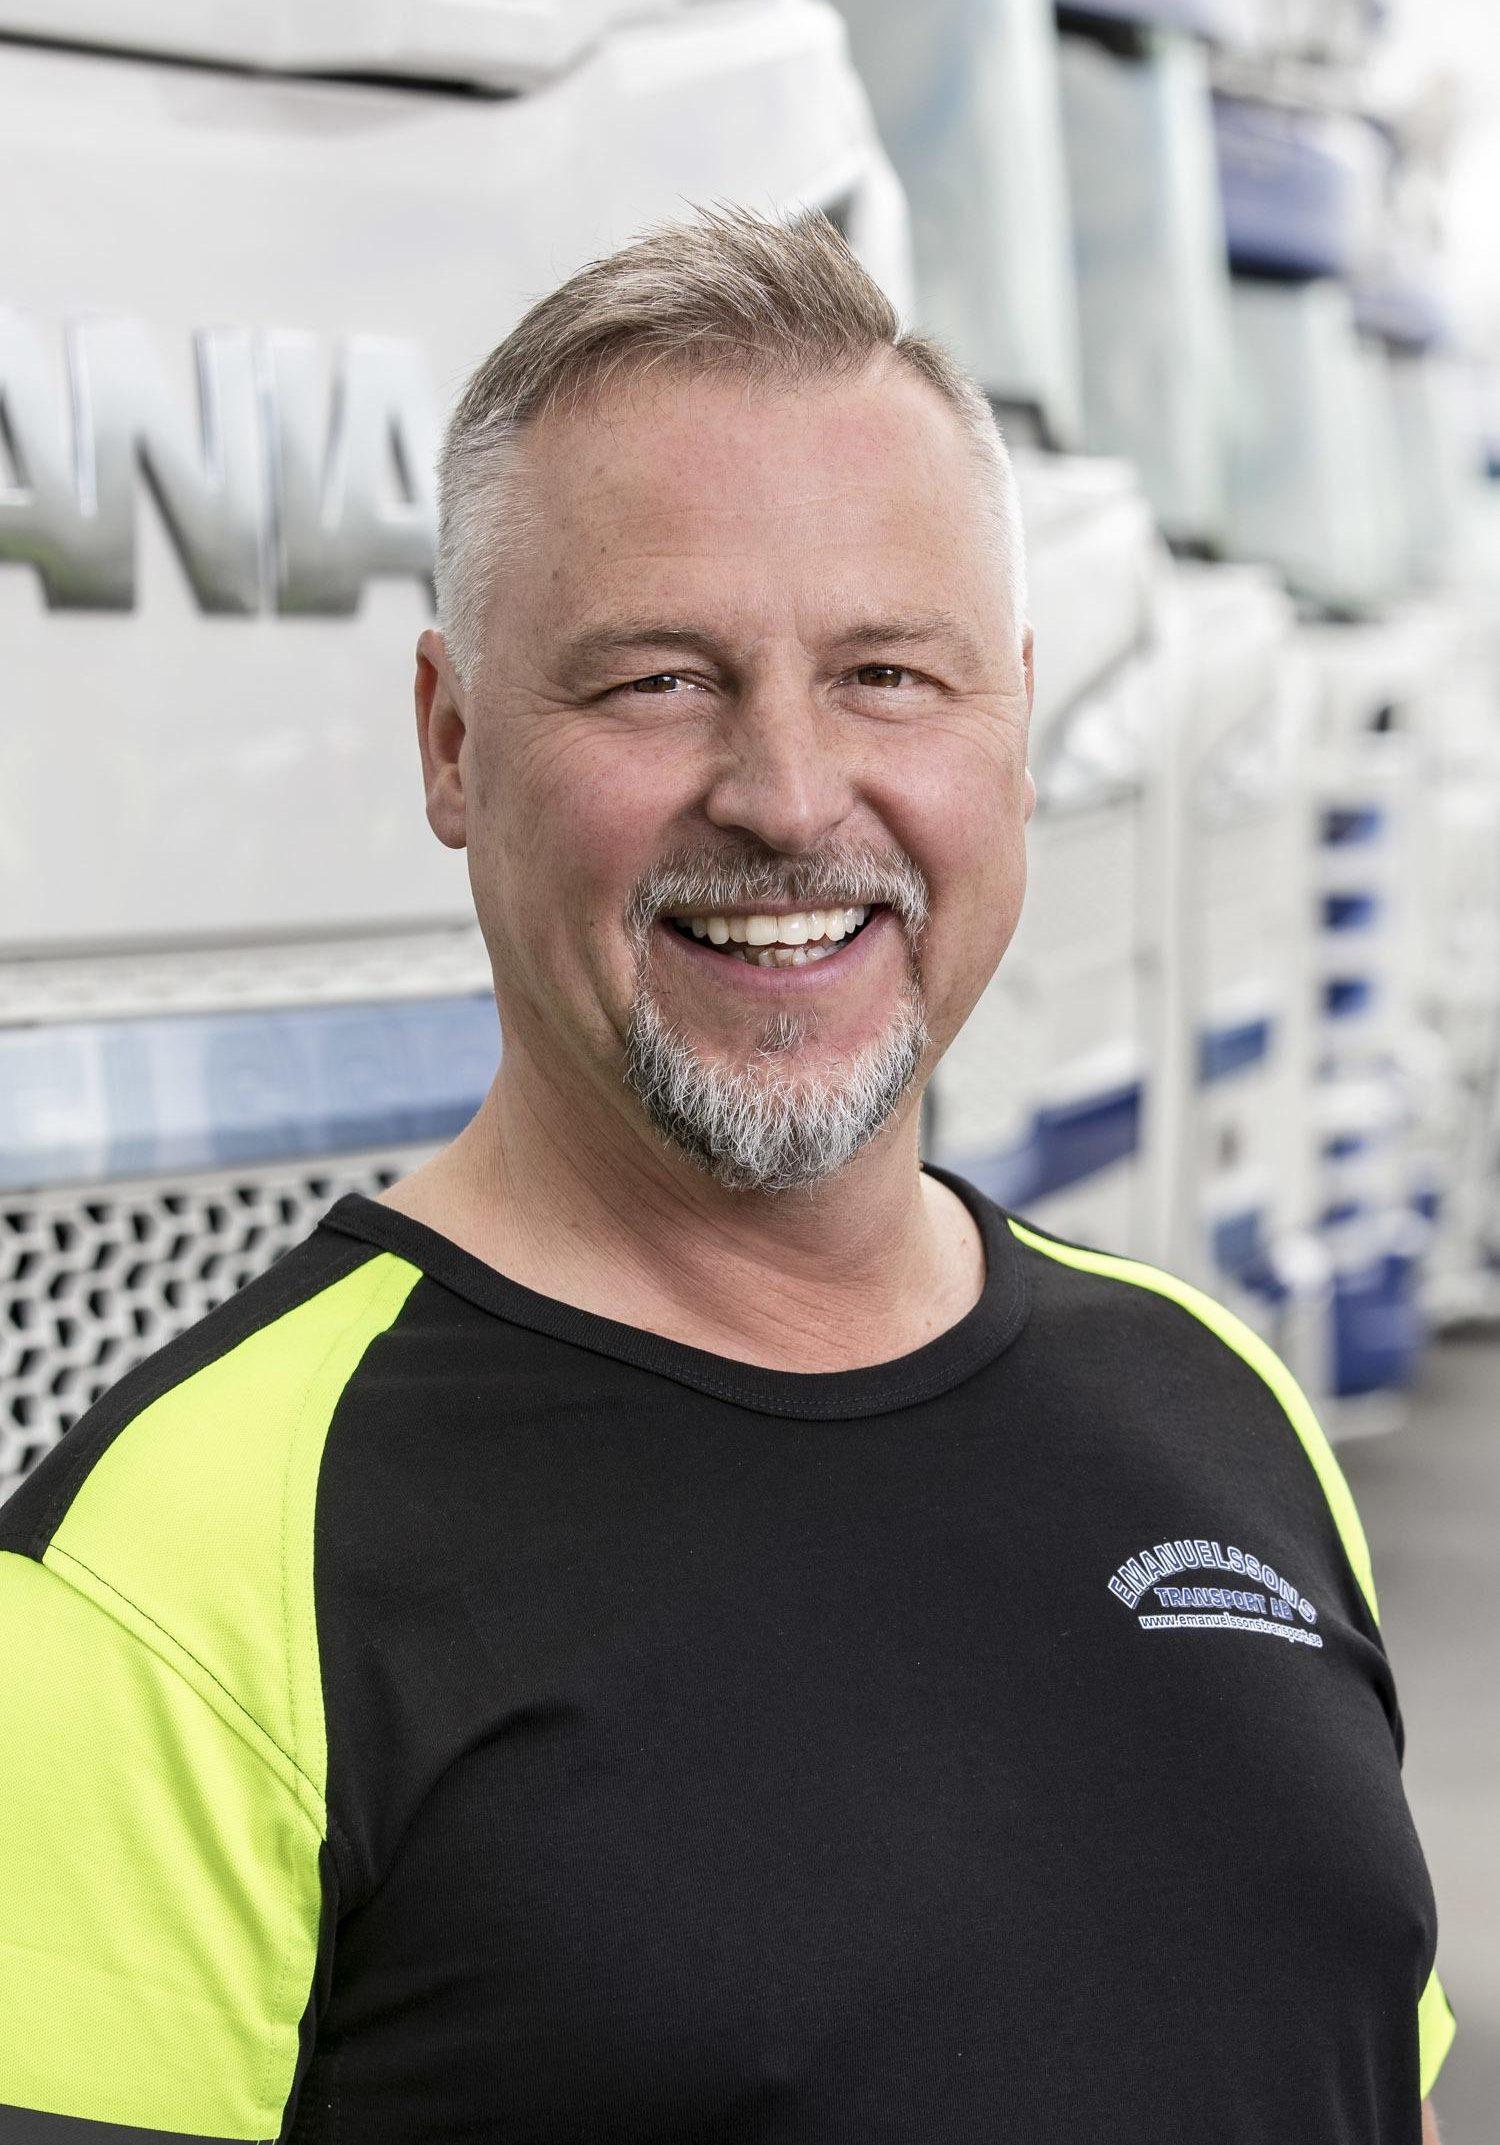 Jens Emanuelsson